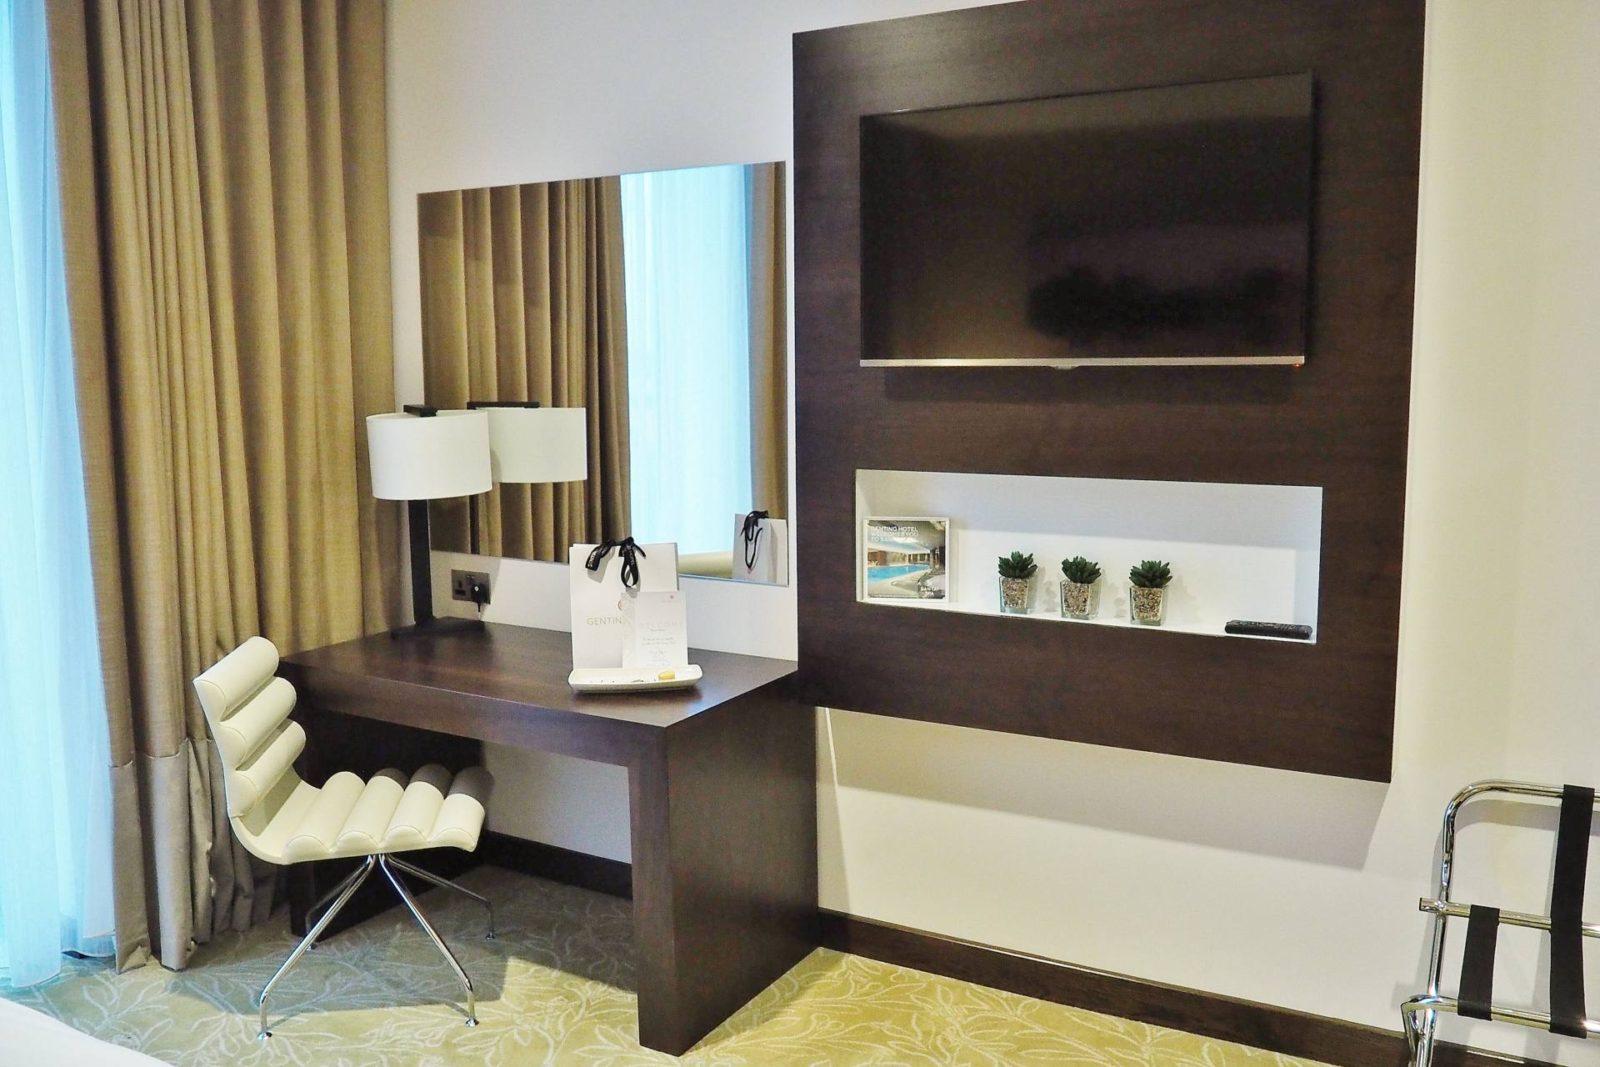 Genting Hotel Room